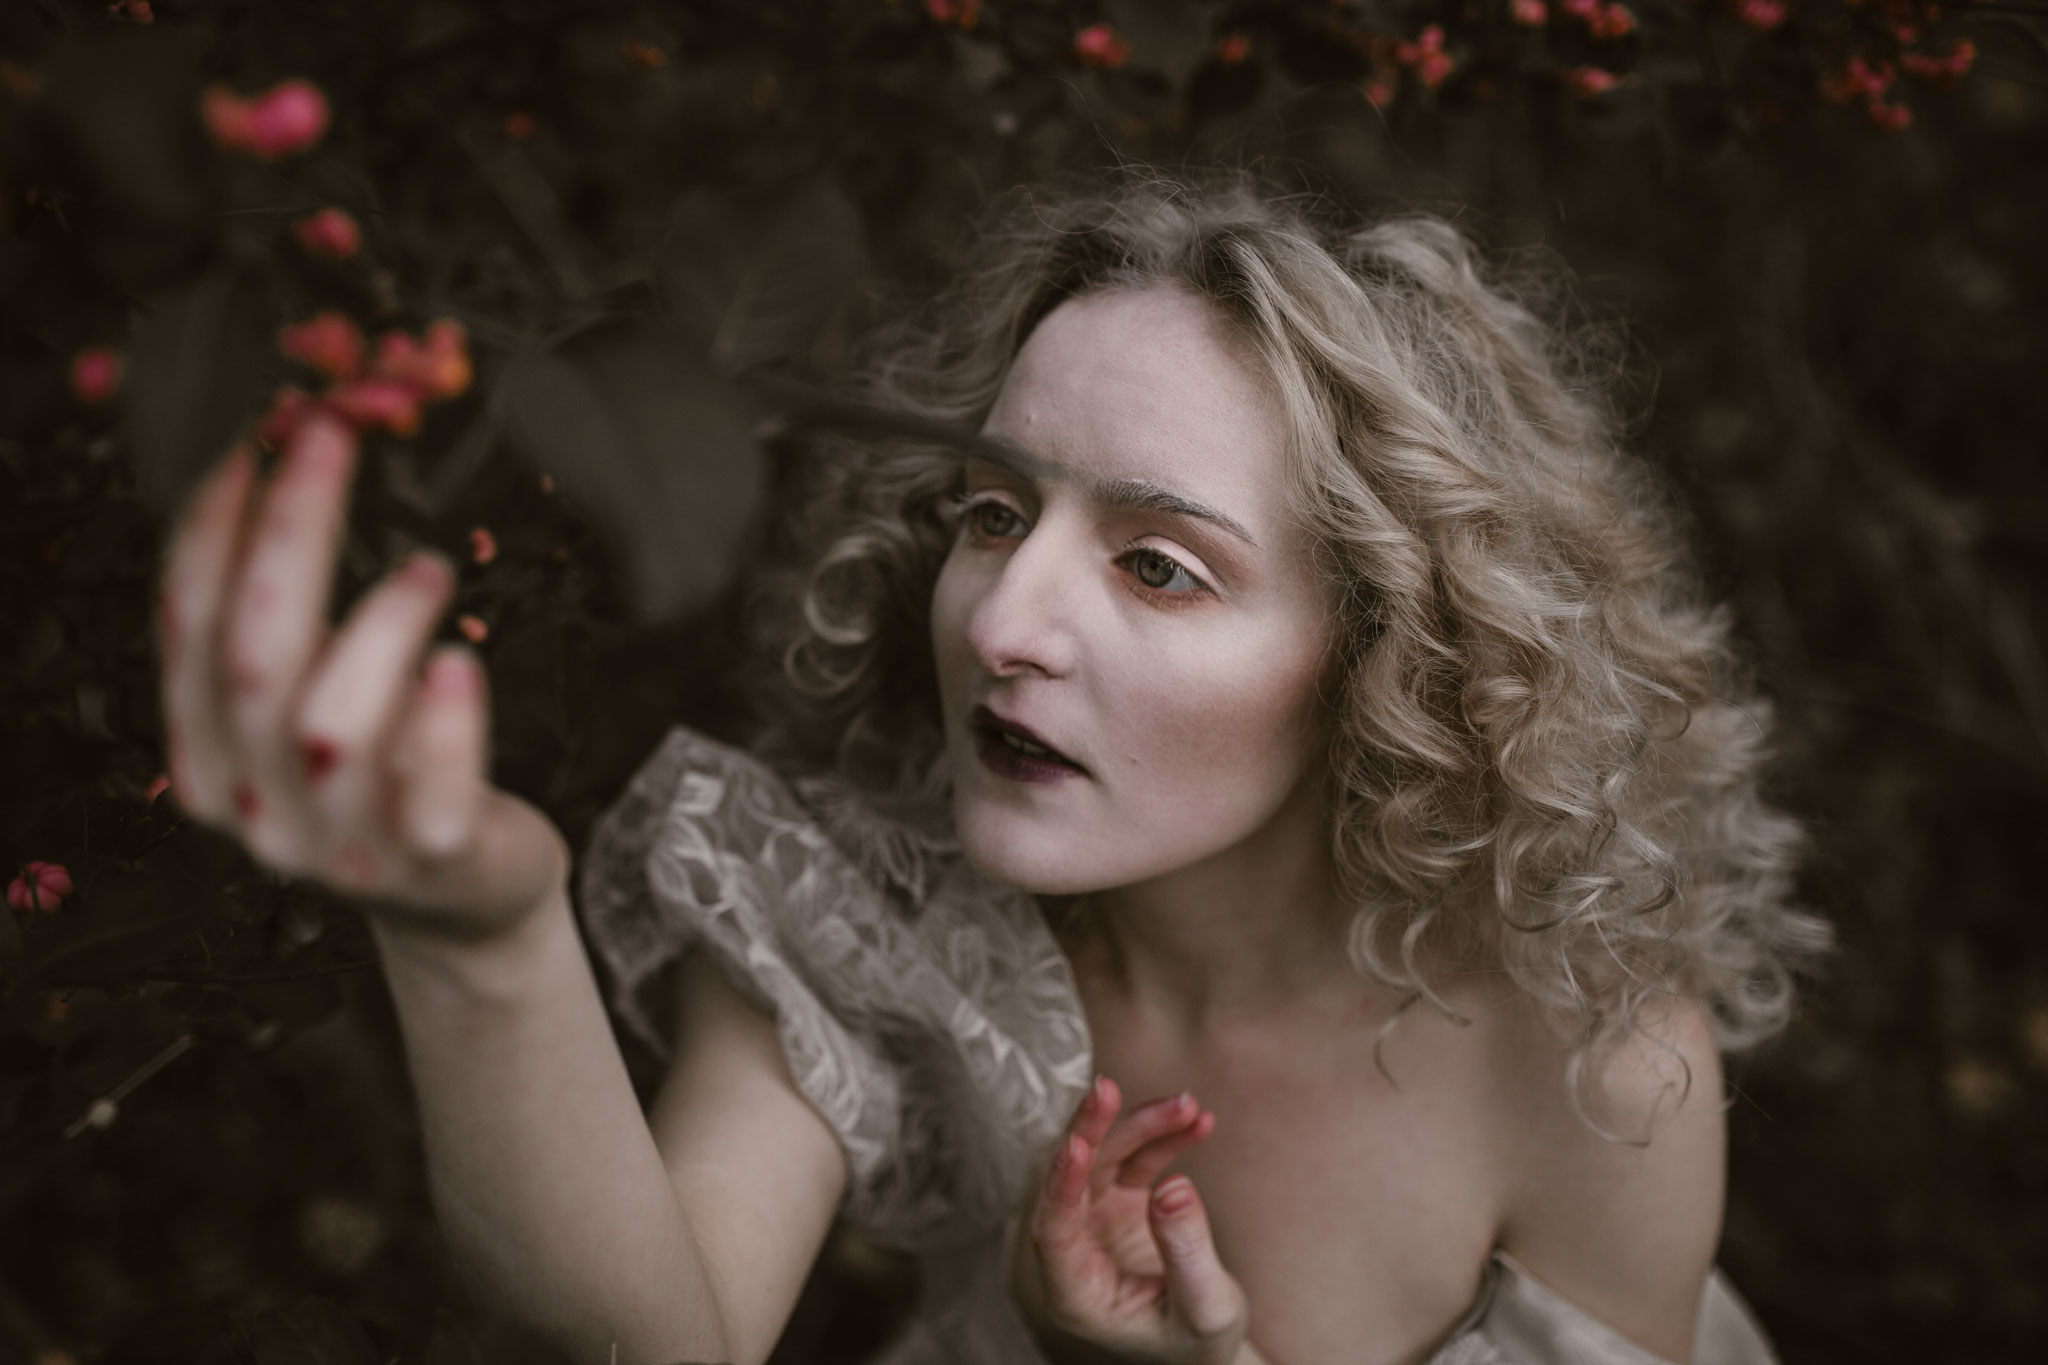 pale-witch-162fb.jpg